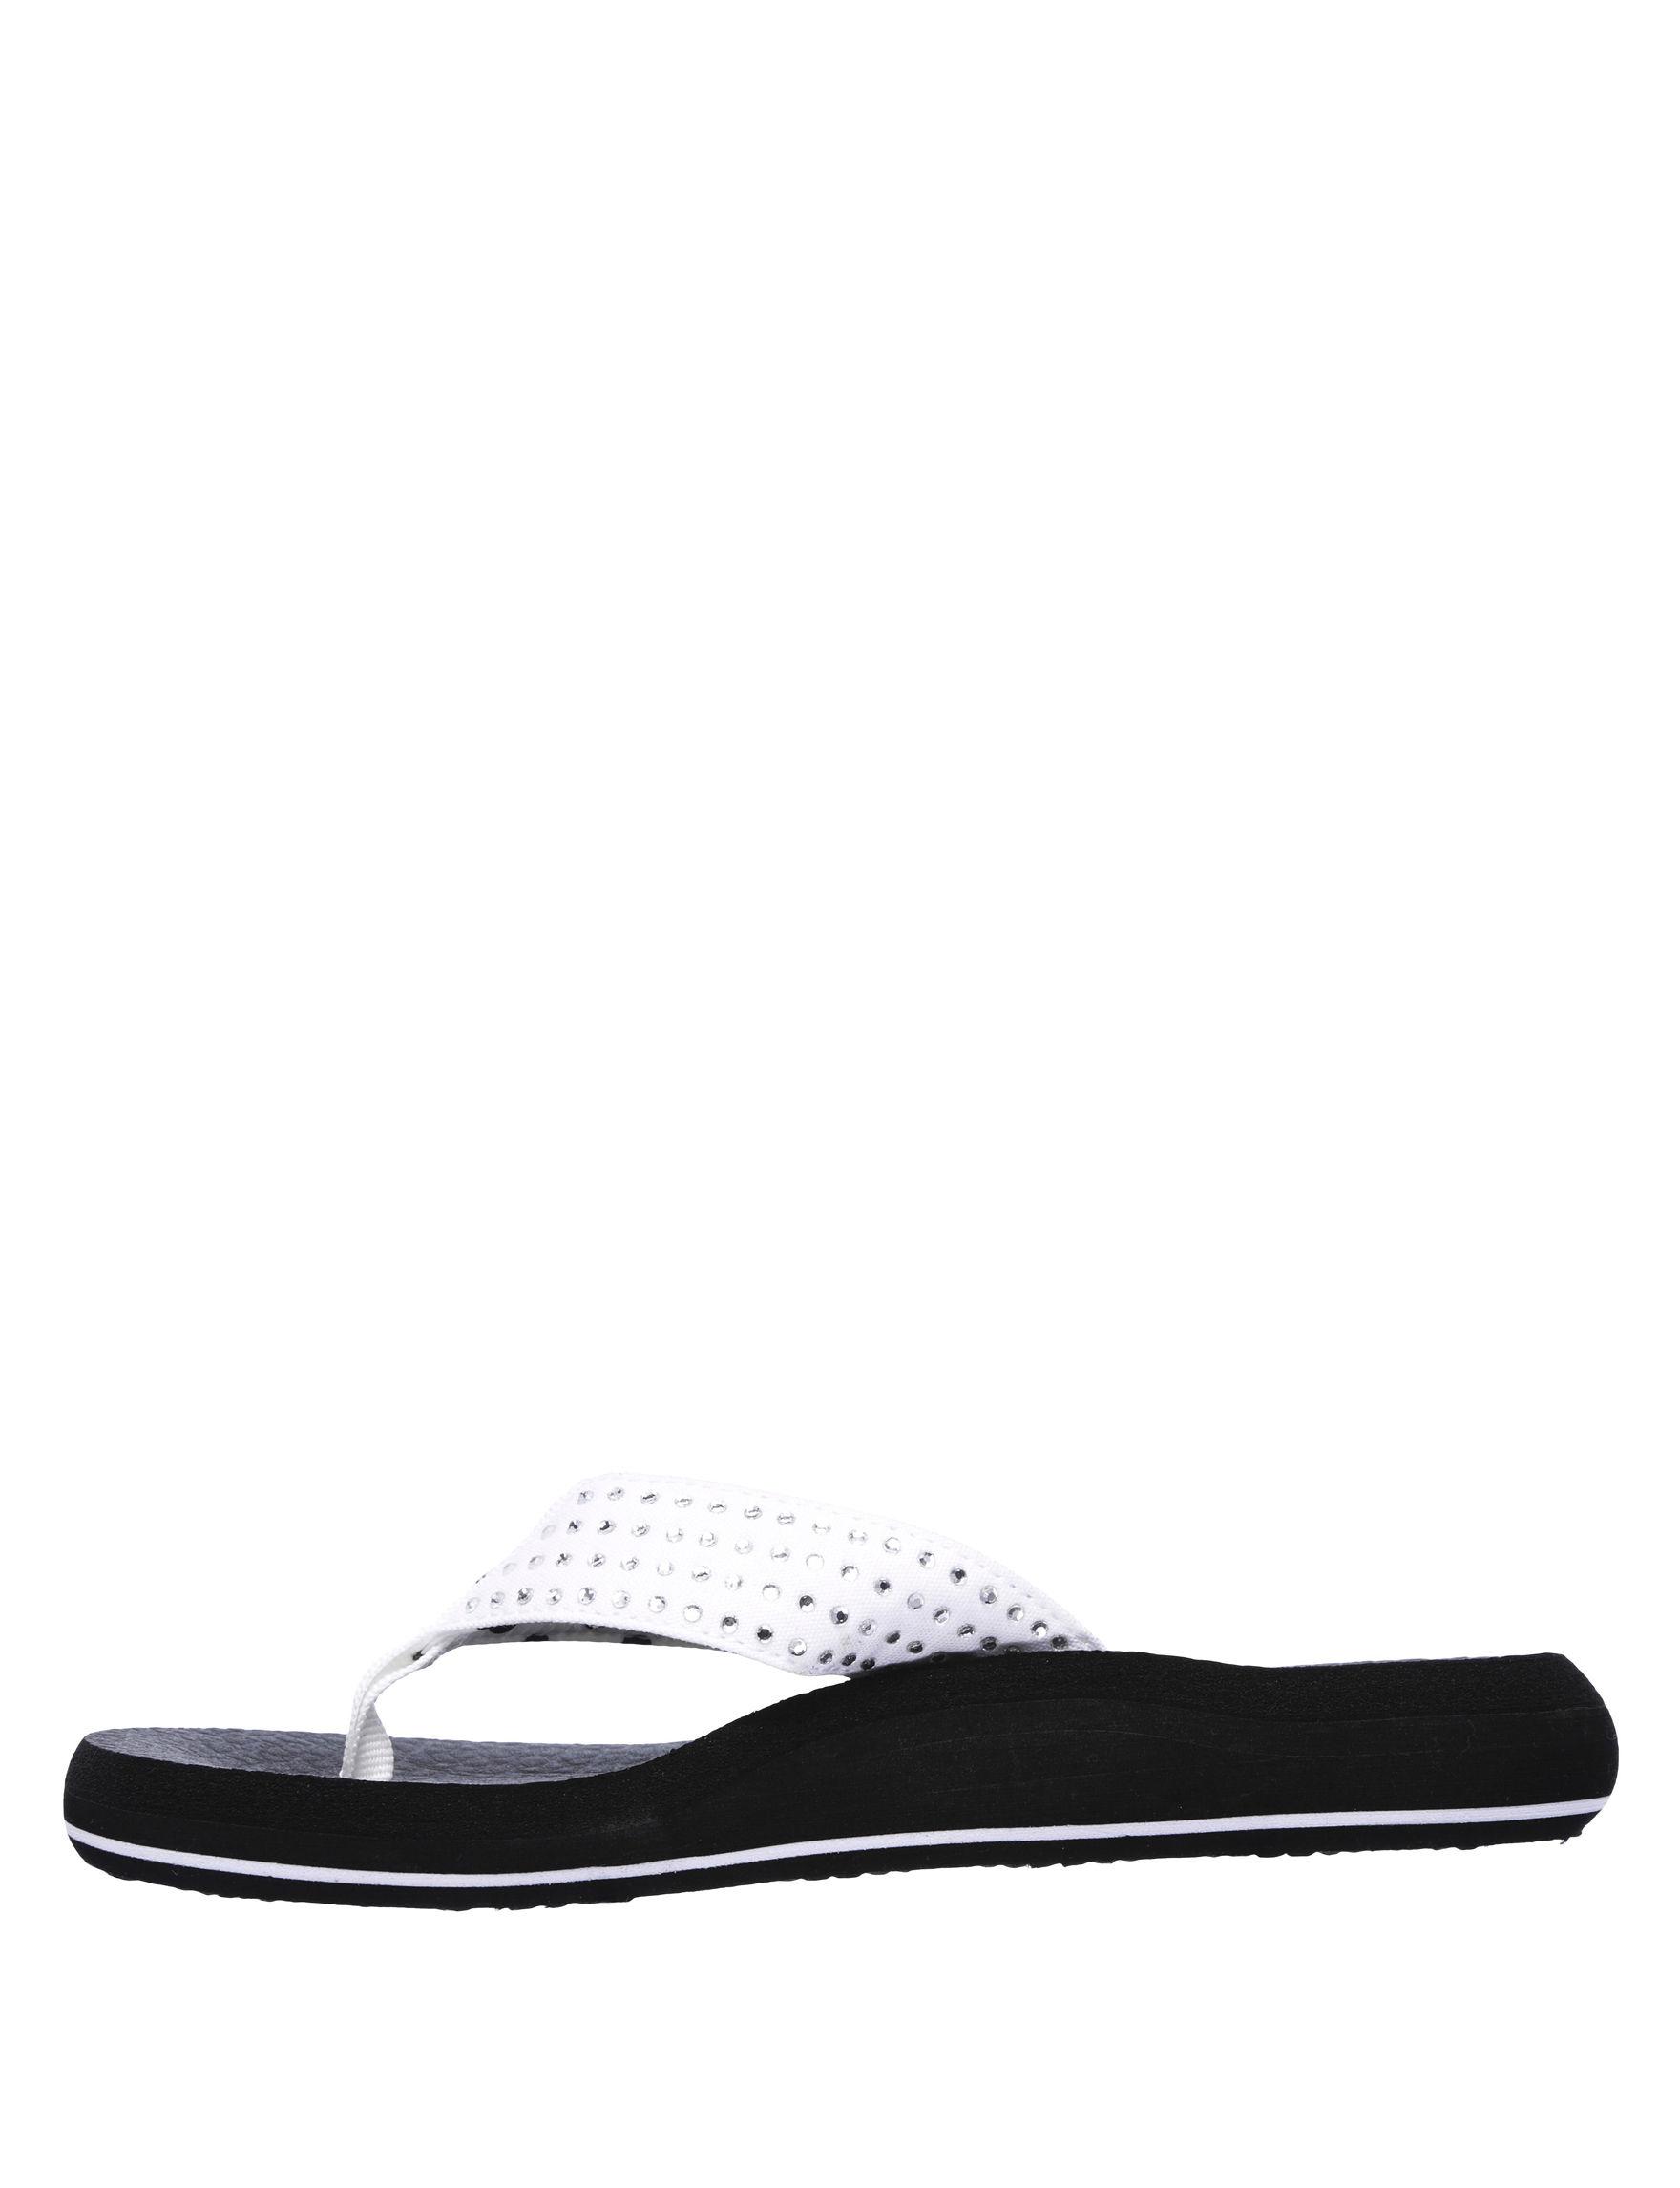 58873ebcce18 Skechers Asana New Age Flip Flops